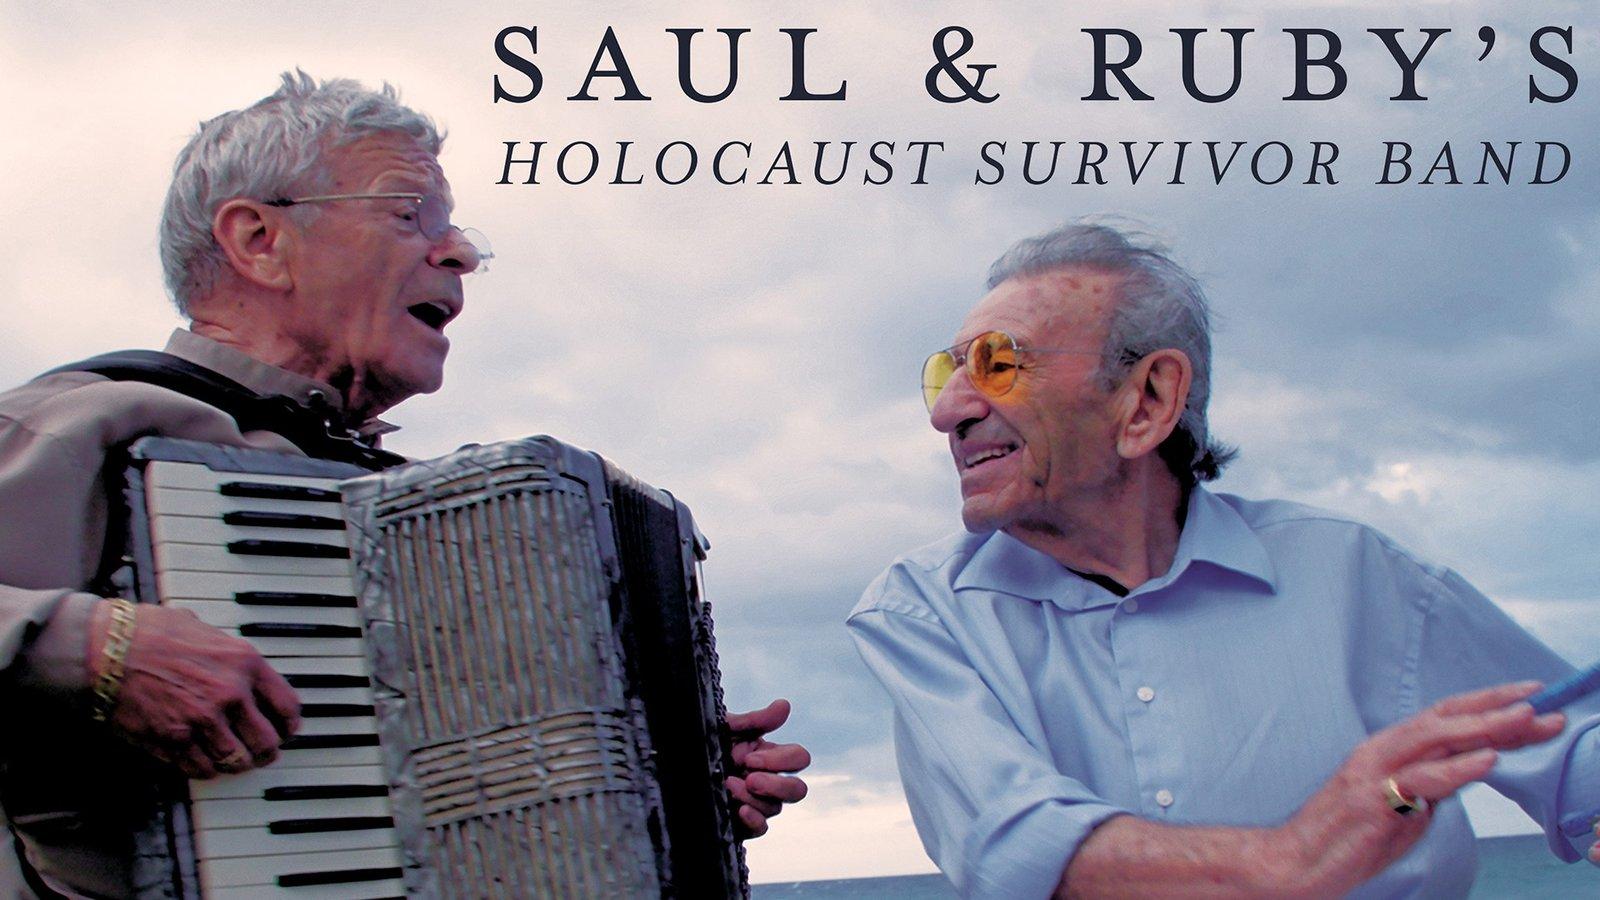 Saul and Ruby's Holocaust Survivor Band